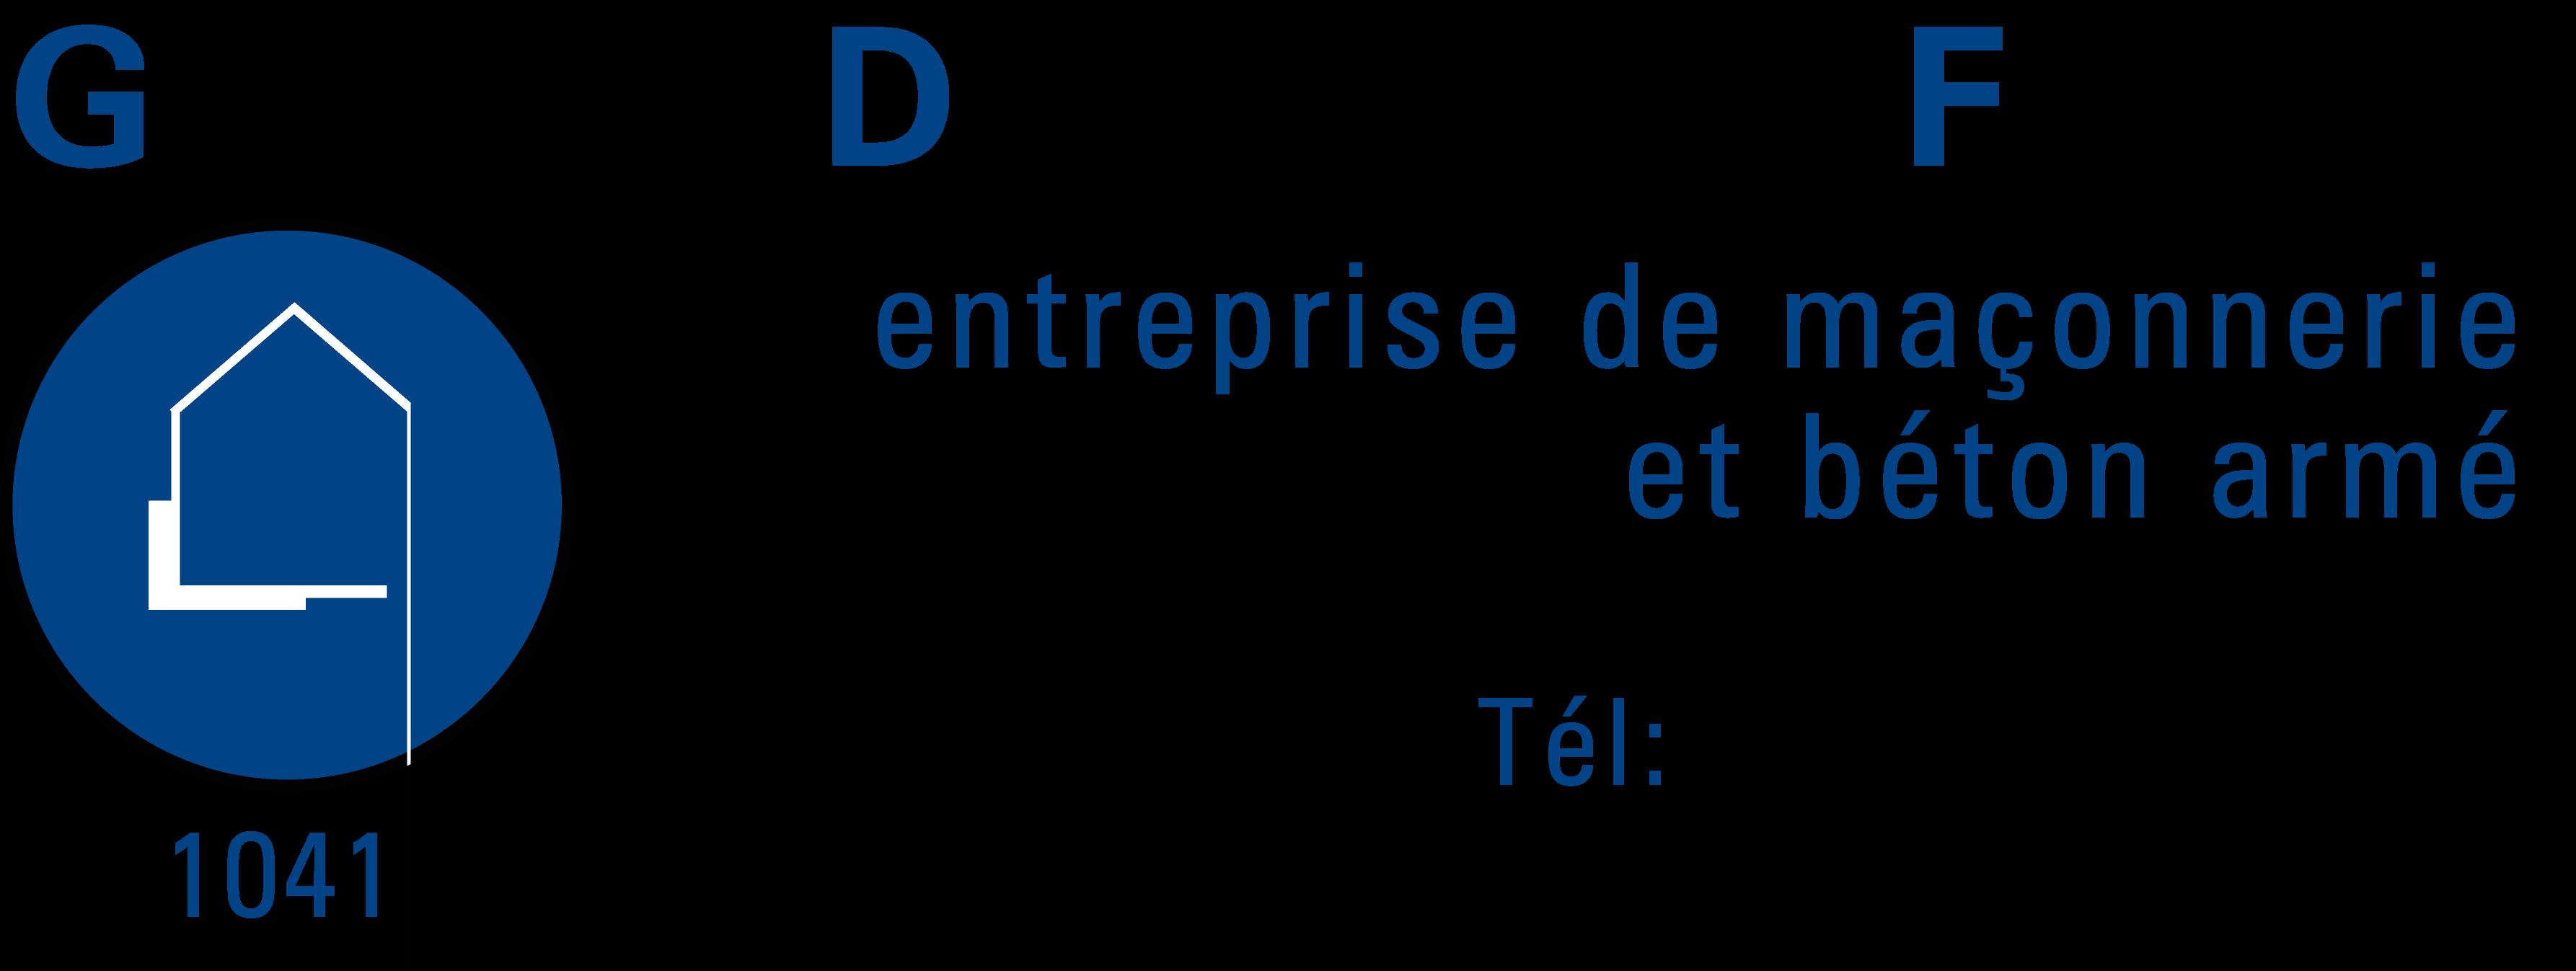 Georges Demierre & Fils